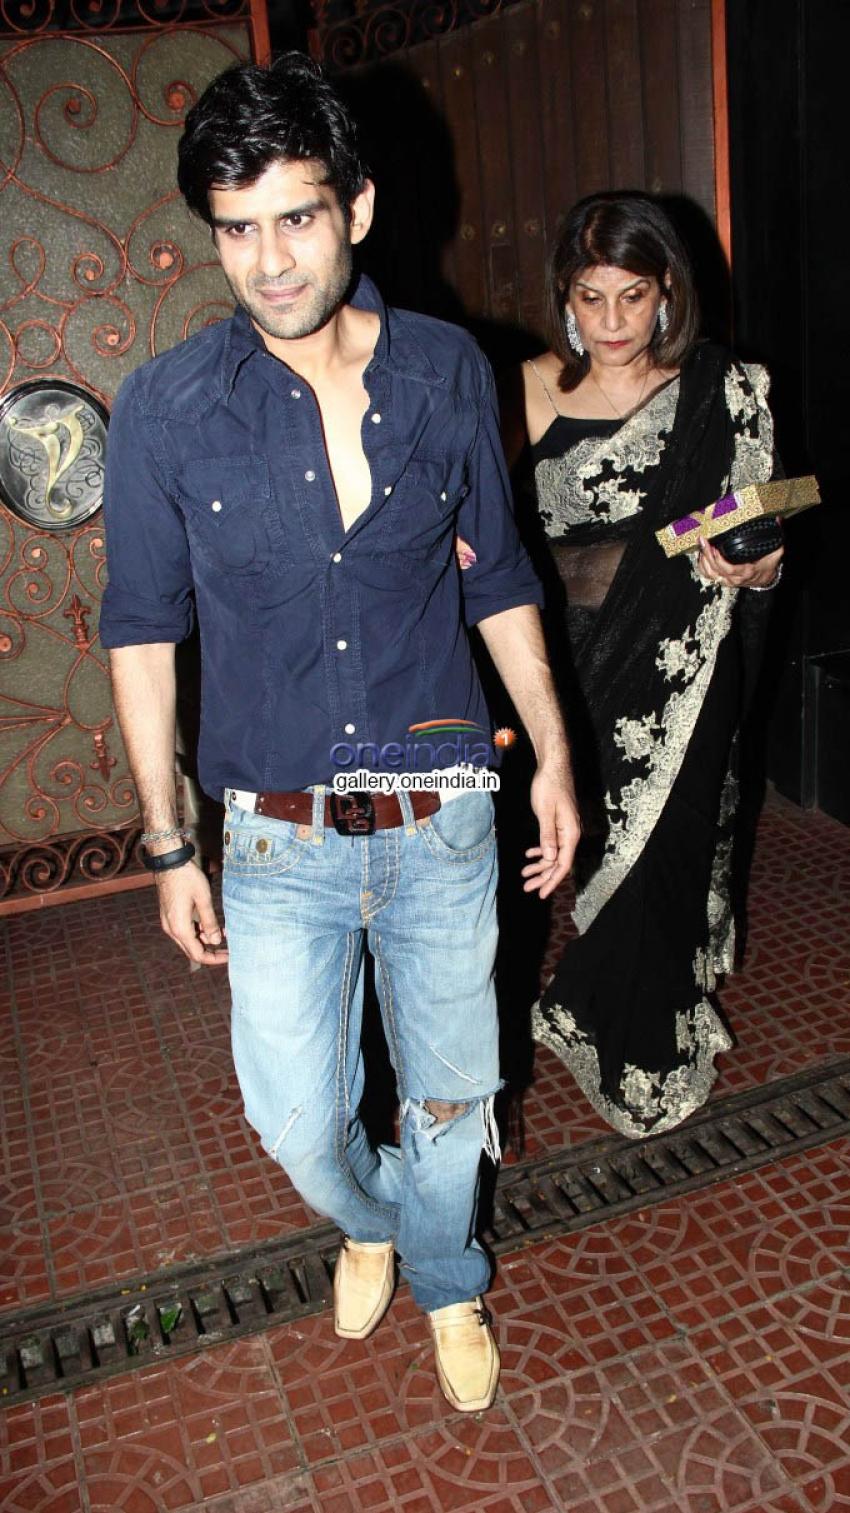 Celebs Come to Wish Newly Wedded Couple Rani & Aditya Chopra Photos